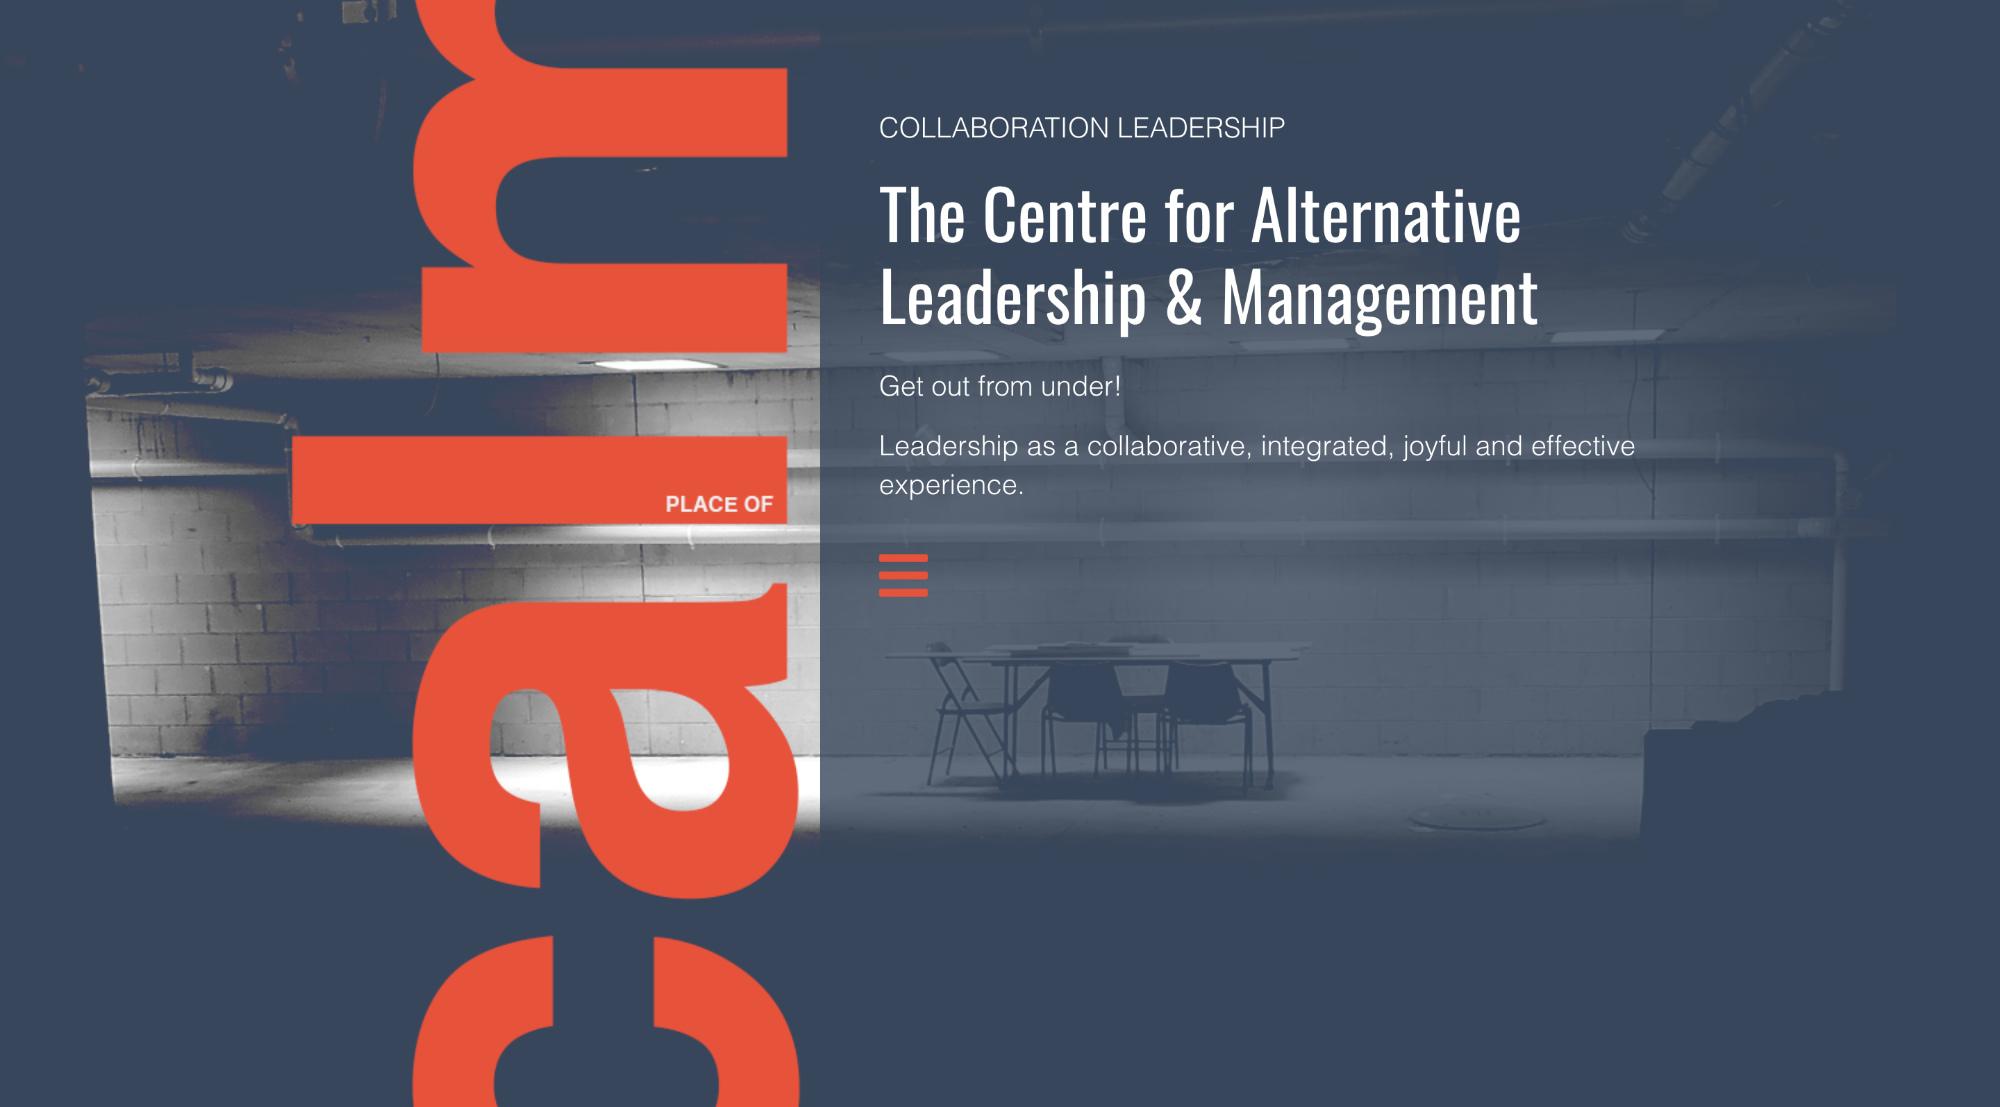 Collaboration Leadership